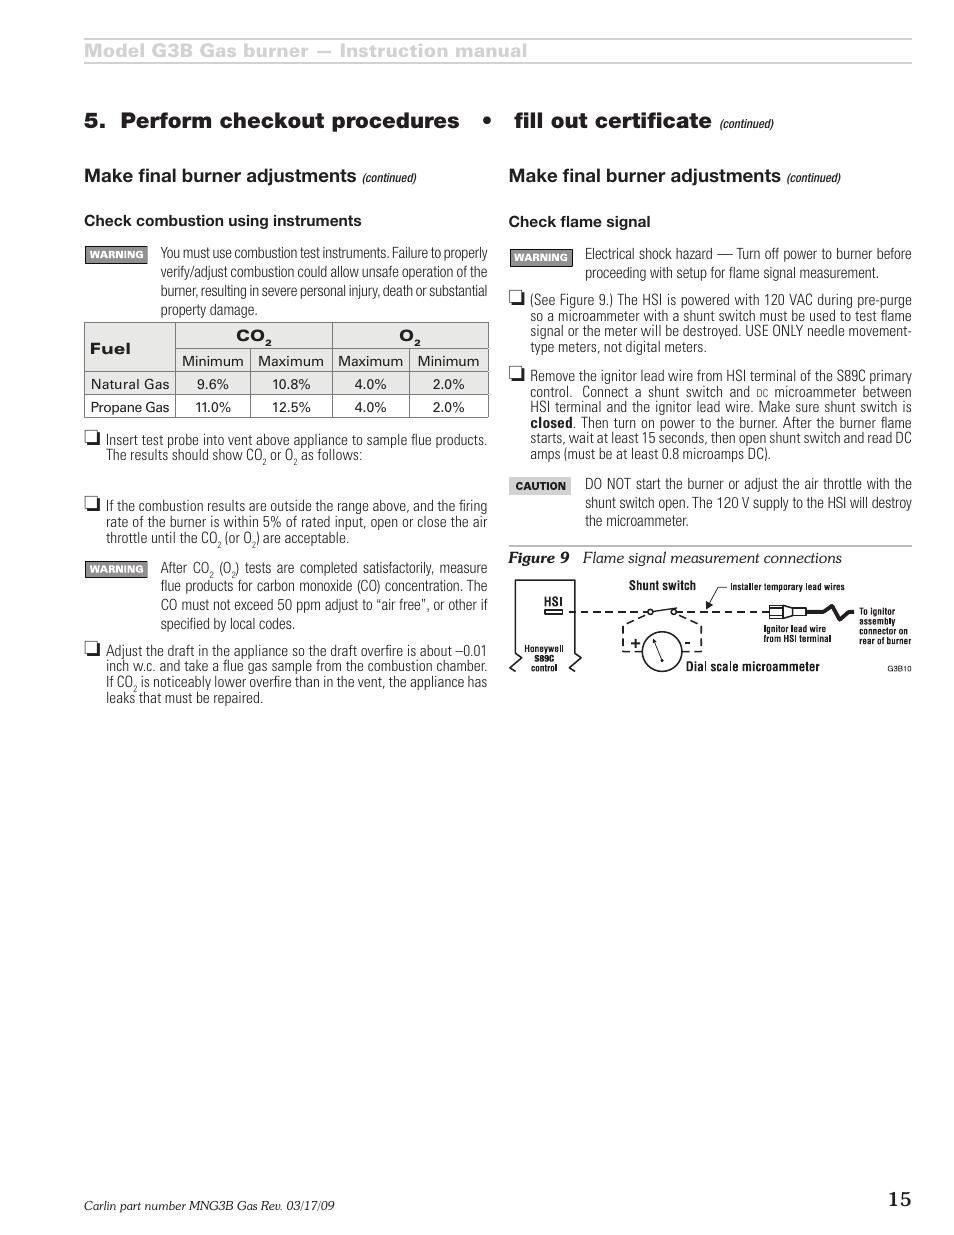 model g3b gas burner instruction manual 15 make fi nal burner rh manualsdir com Operators Manual Instruction Manual Book